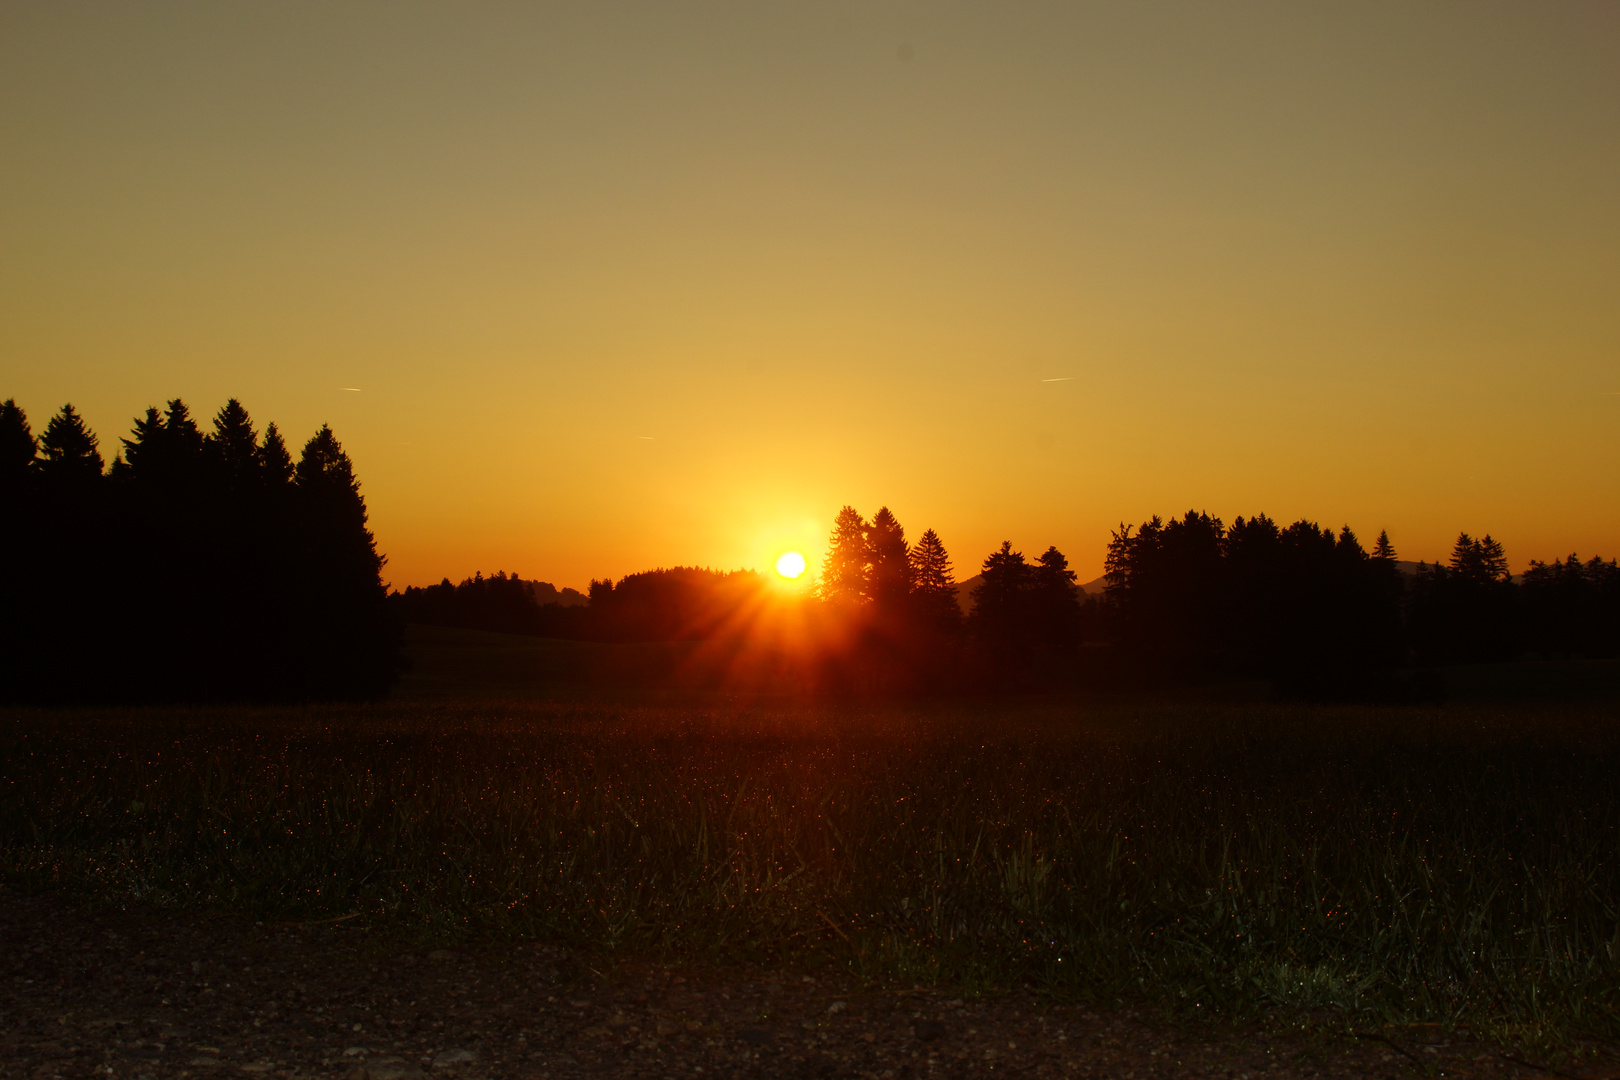 Sonnenaufgang bei Seeg 06.09.2013 (2)